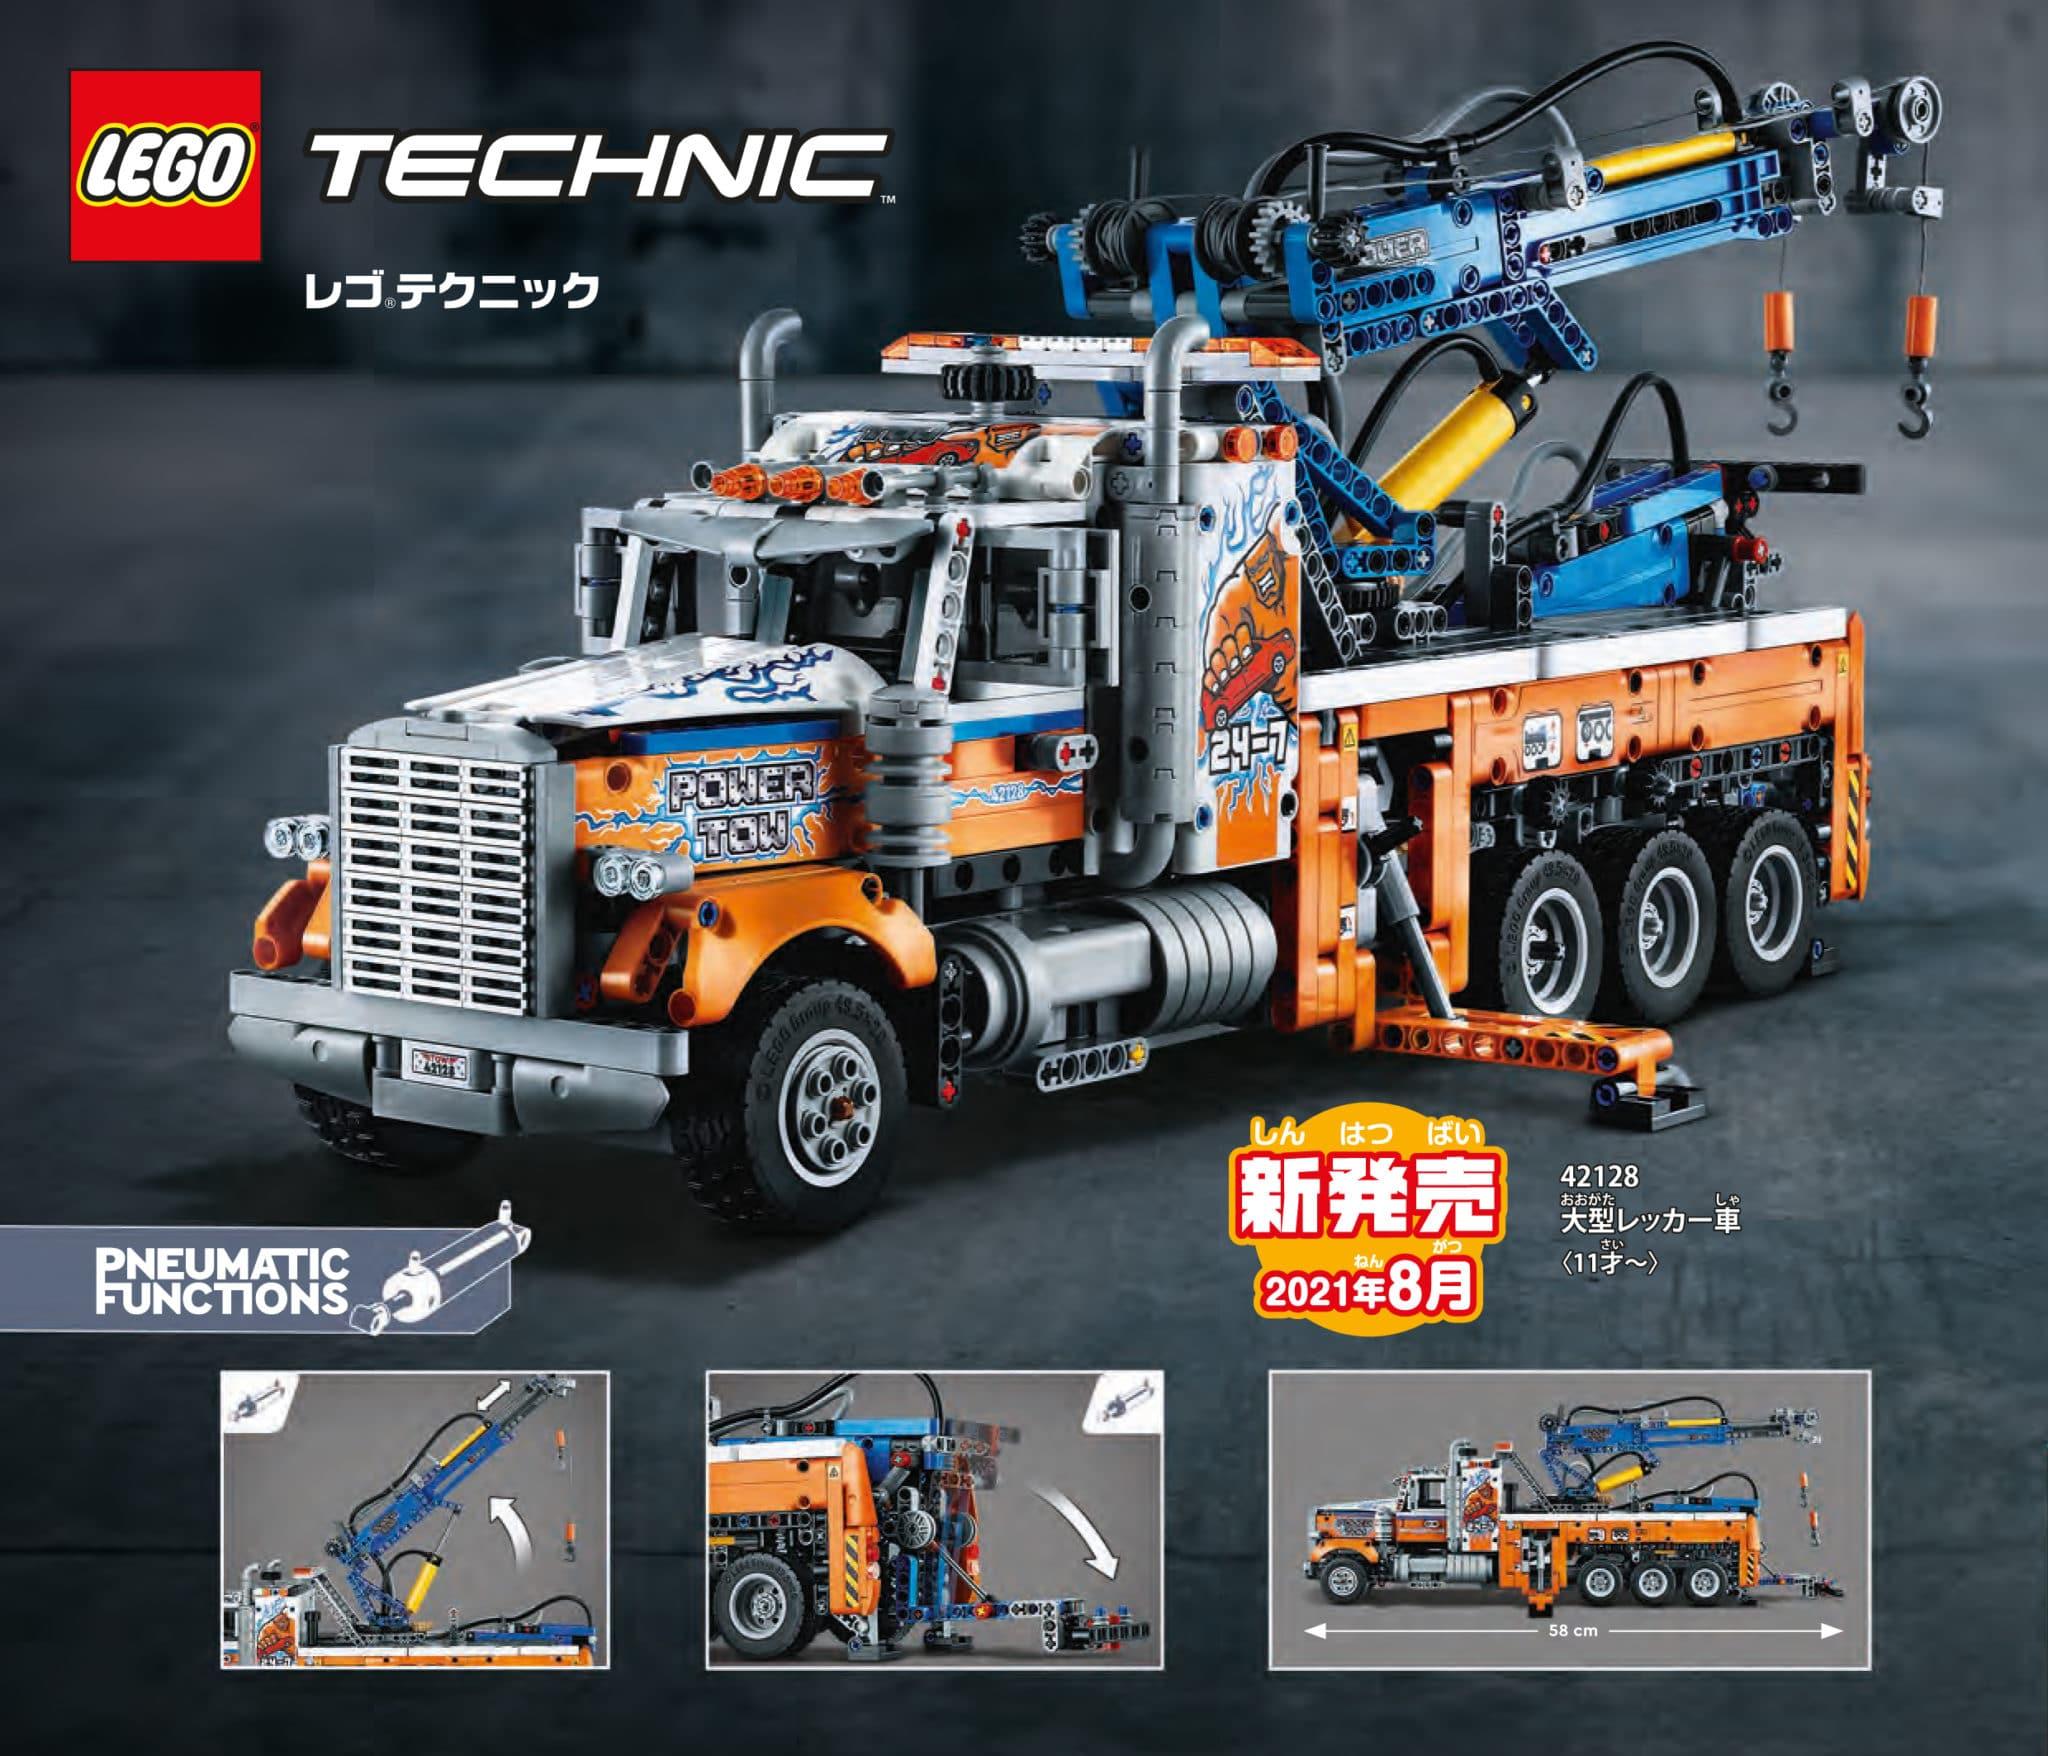 LEGO Technic 42128 Schwerlast Abschleppwagen Katalog Japan